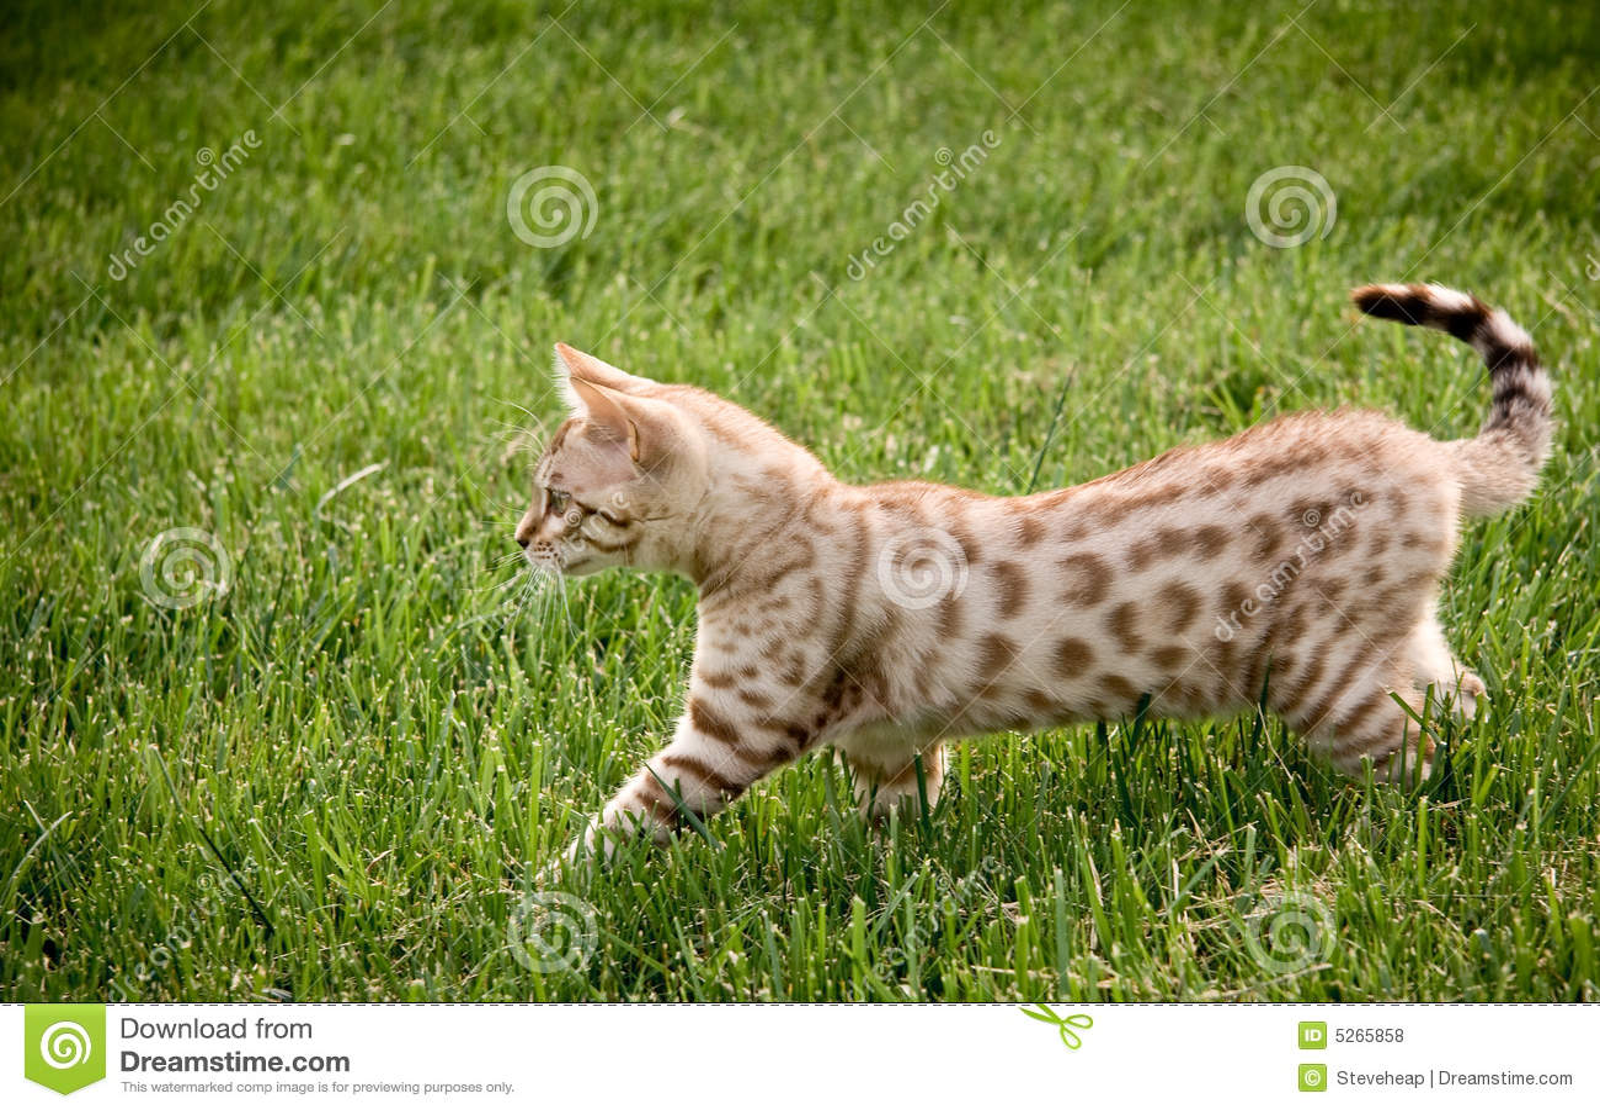 Young bengal kitten